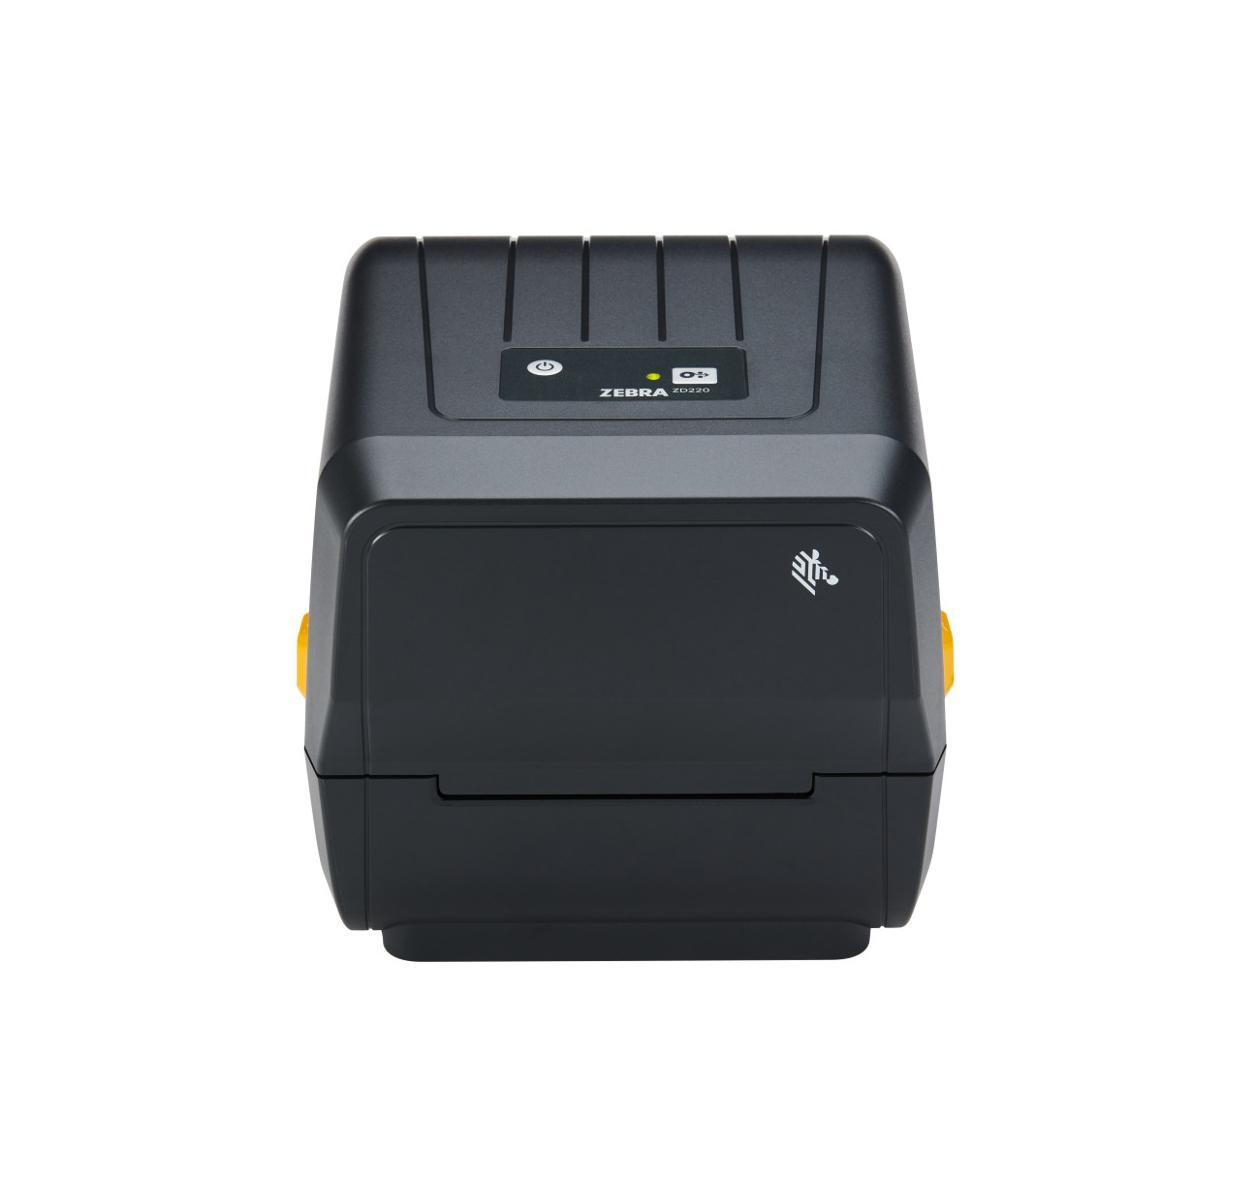 Zebra ZD230t Thermal Transfer Printer (74/300M) ZD230; Standard EZPL, 203 dpi, EU and UK Power Cords, USB